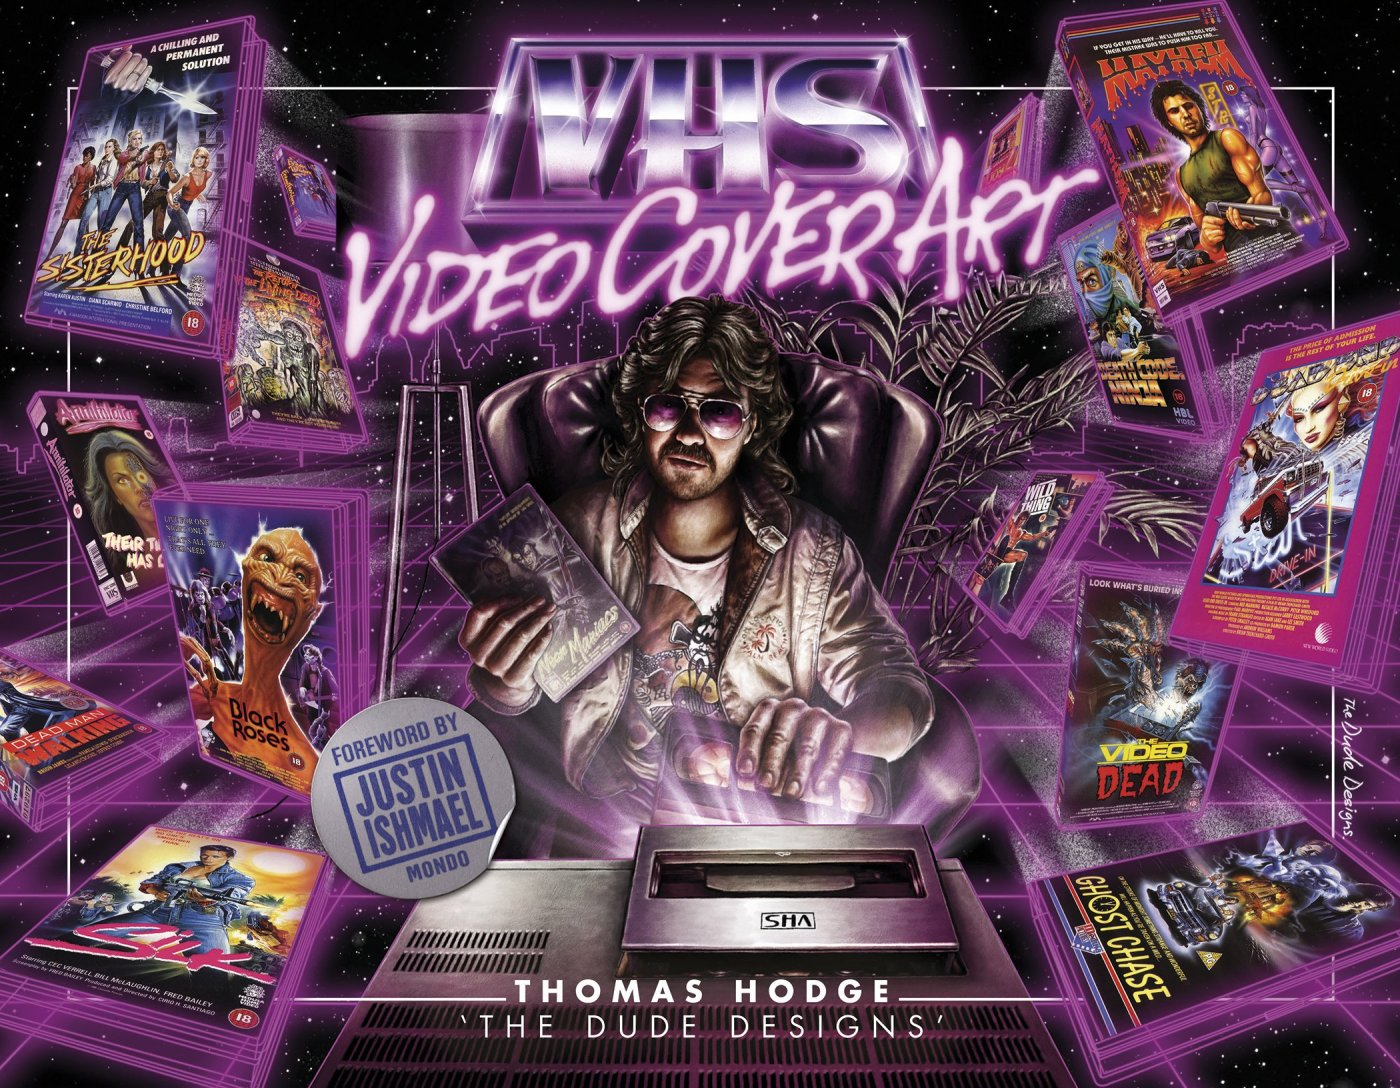 vhs video cover art por thomas hodge